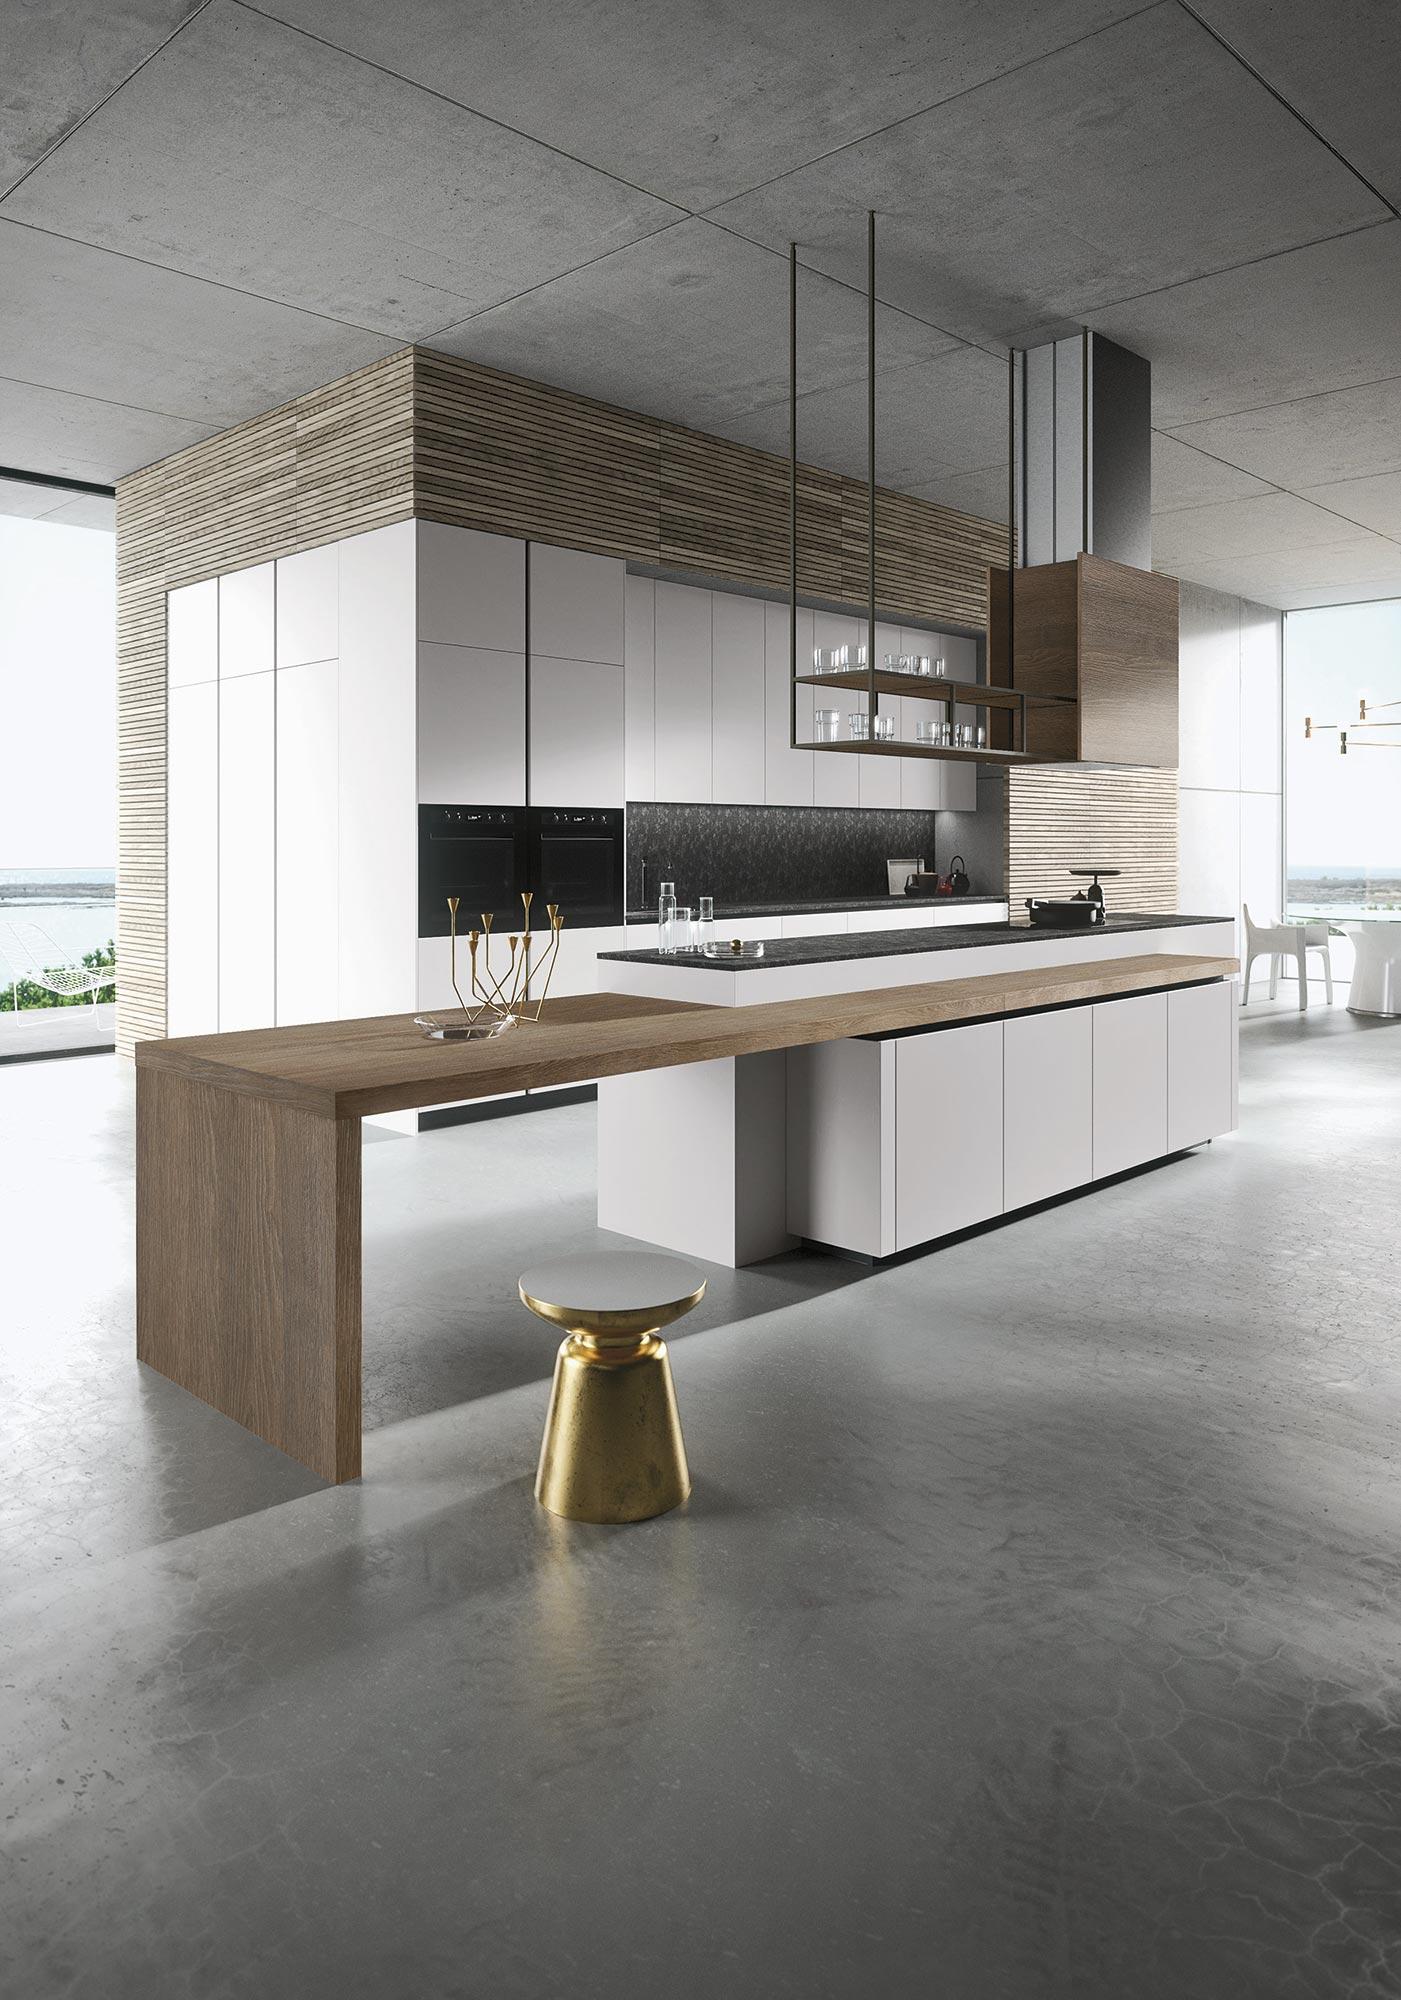 10x de mooiste moderne keukens alles om van je huis je thuis te maken Kitchen backsplash ideas singapore